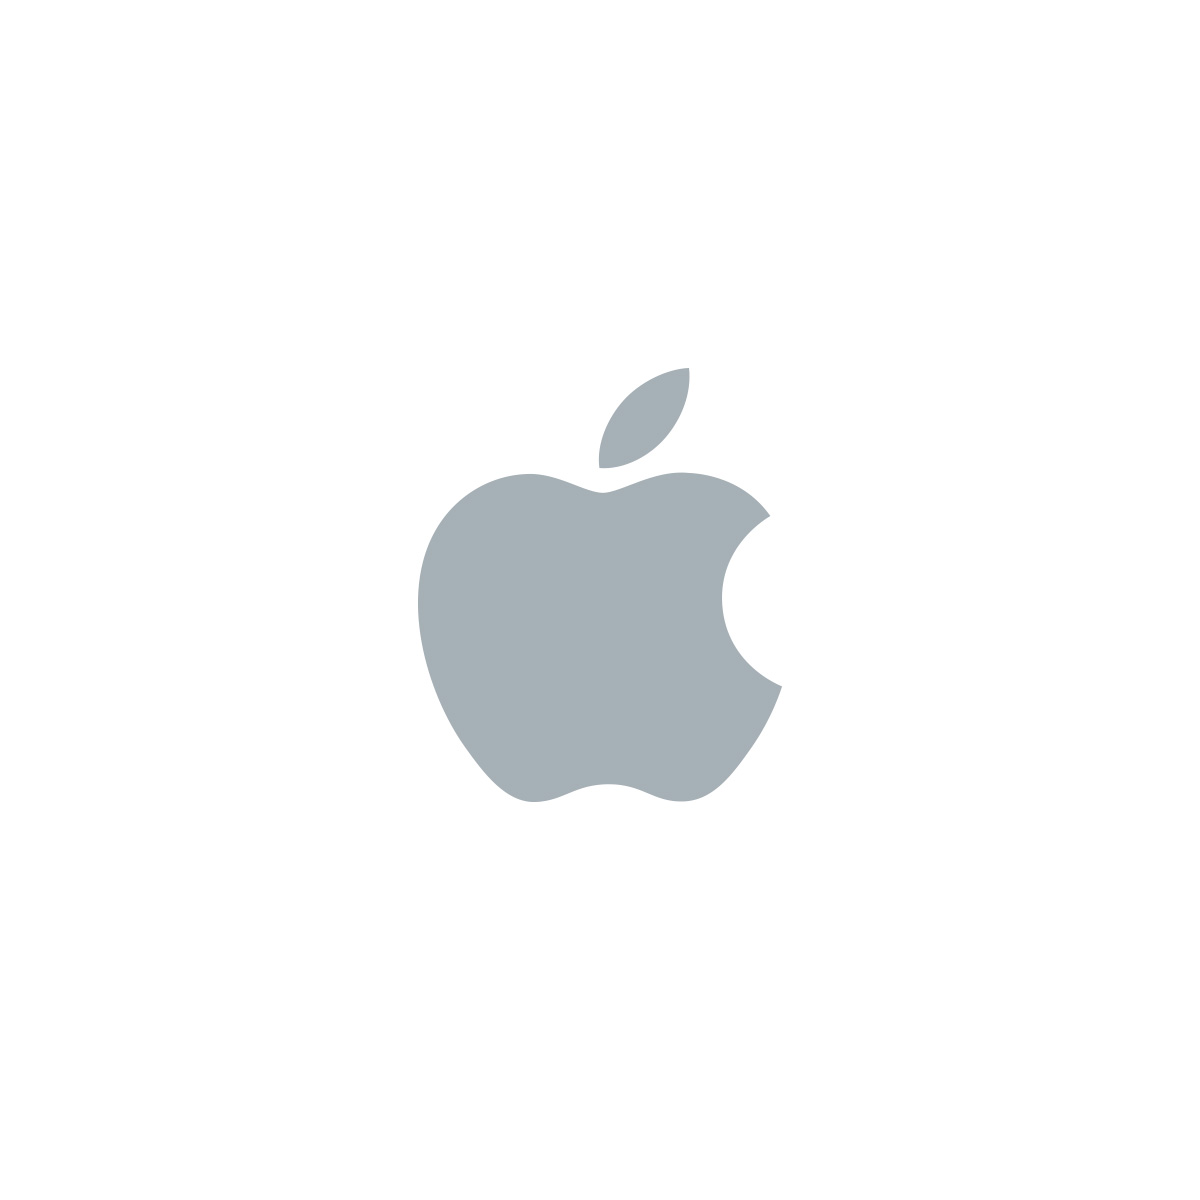 Apple, como convertir clientes en fans